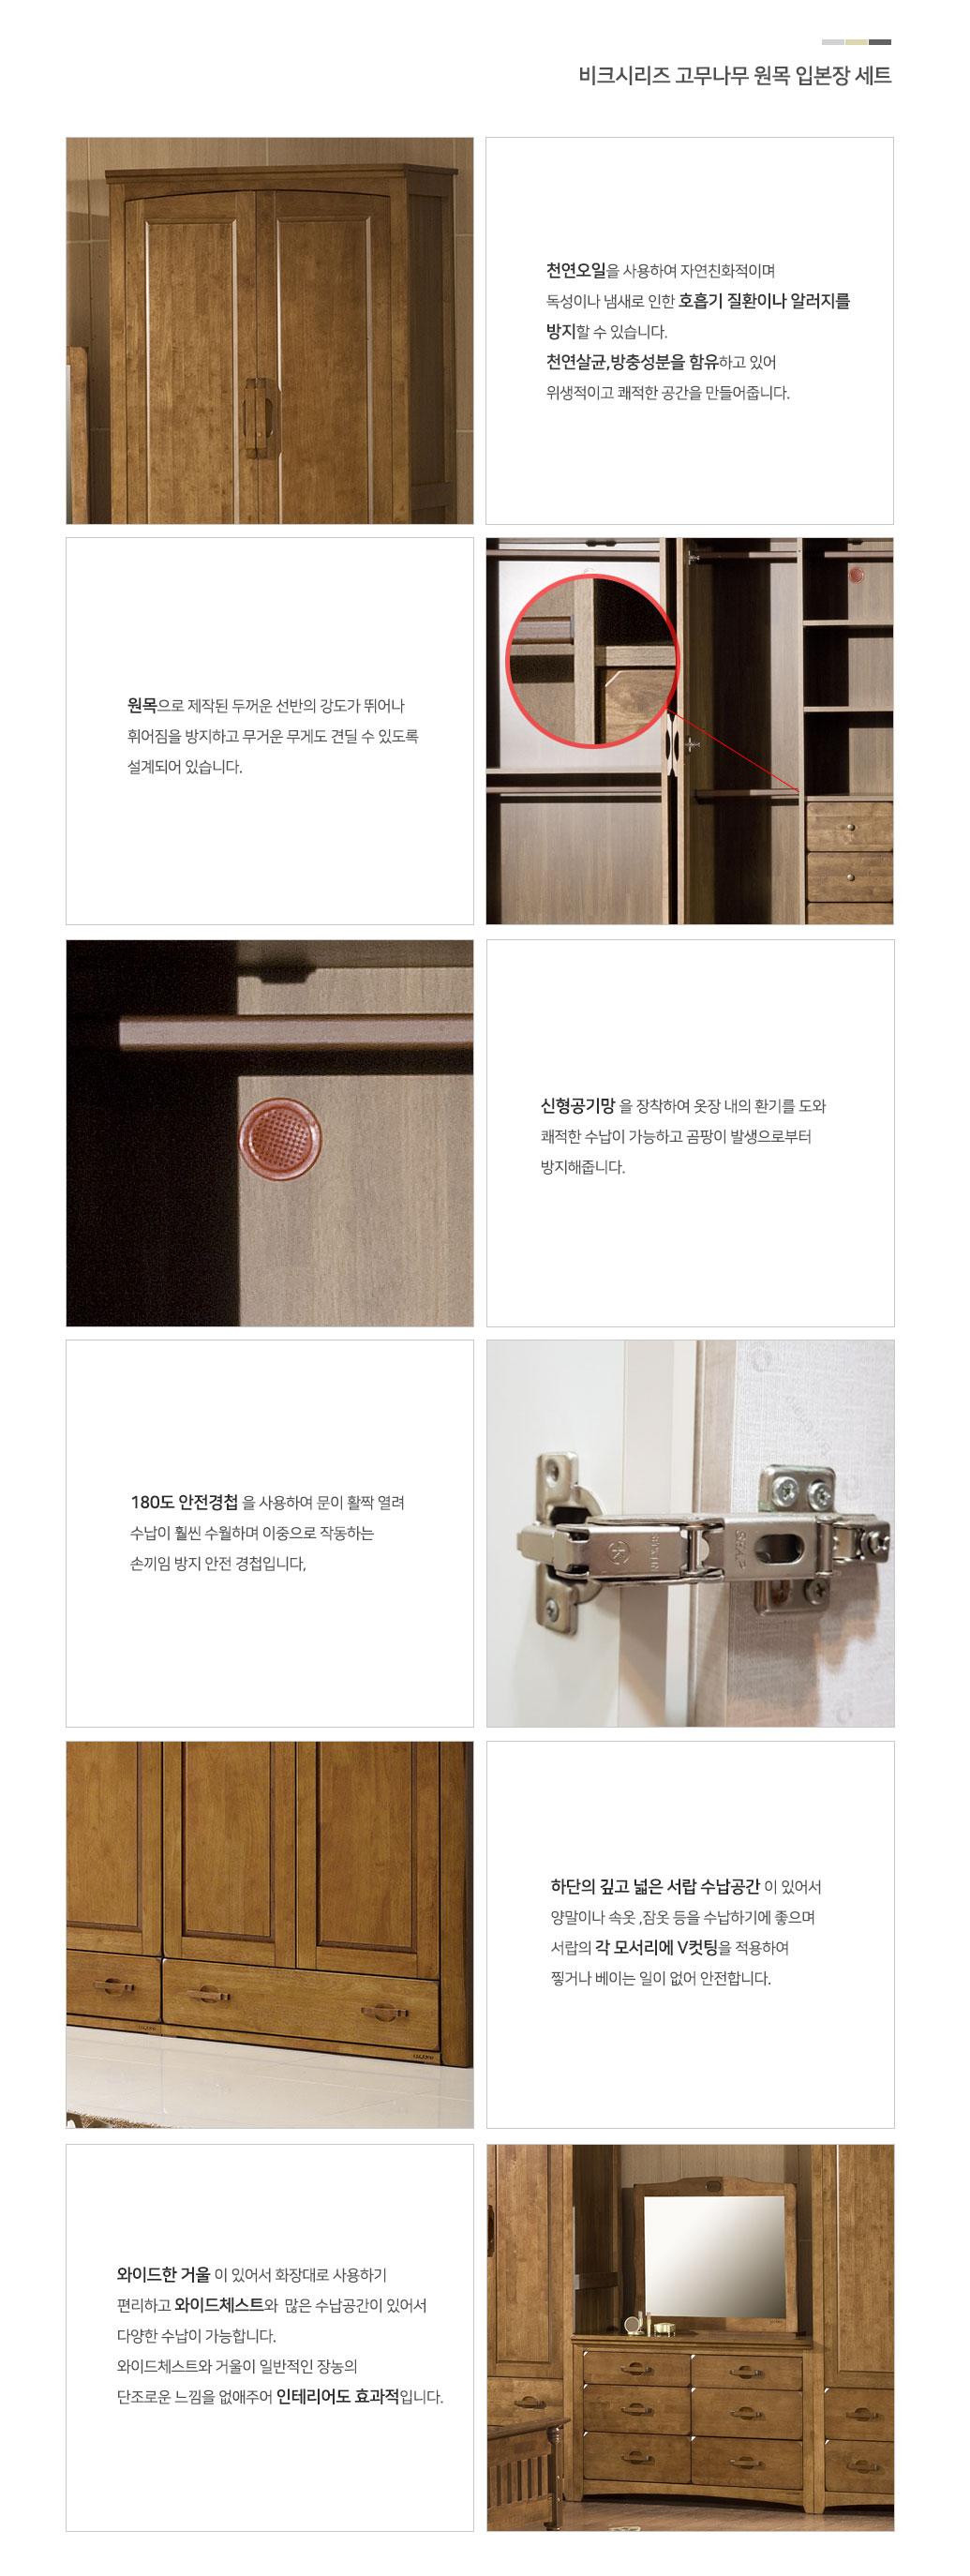 veek_closet2_05.jpg